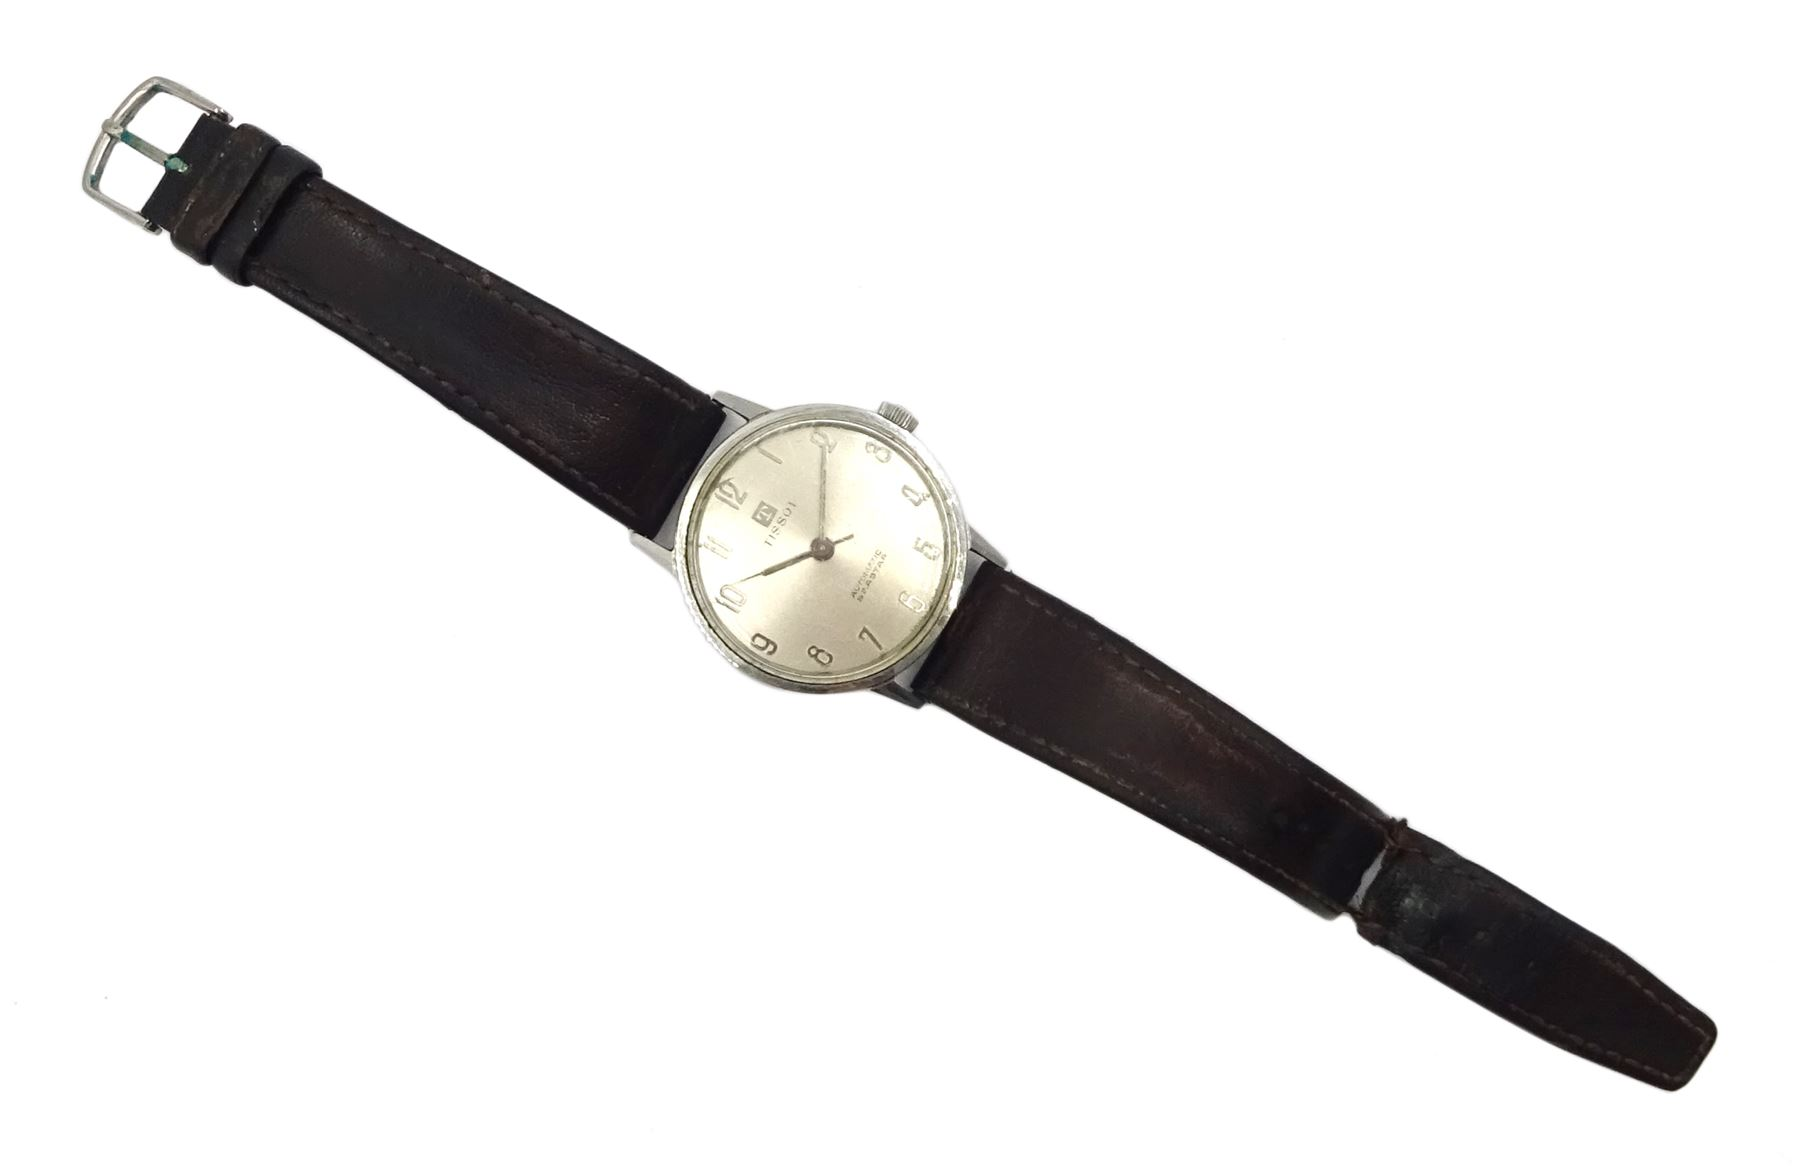 Tissot Automatic Seastar gentleman's stainless steel wristwatch No. 43540 - Image 2 of 3